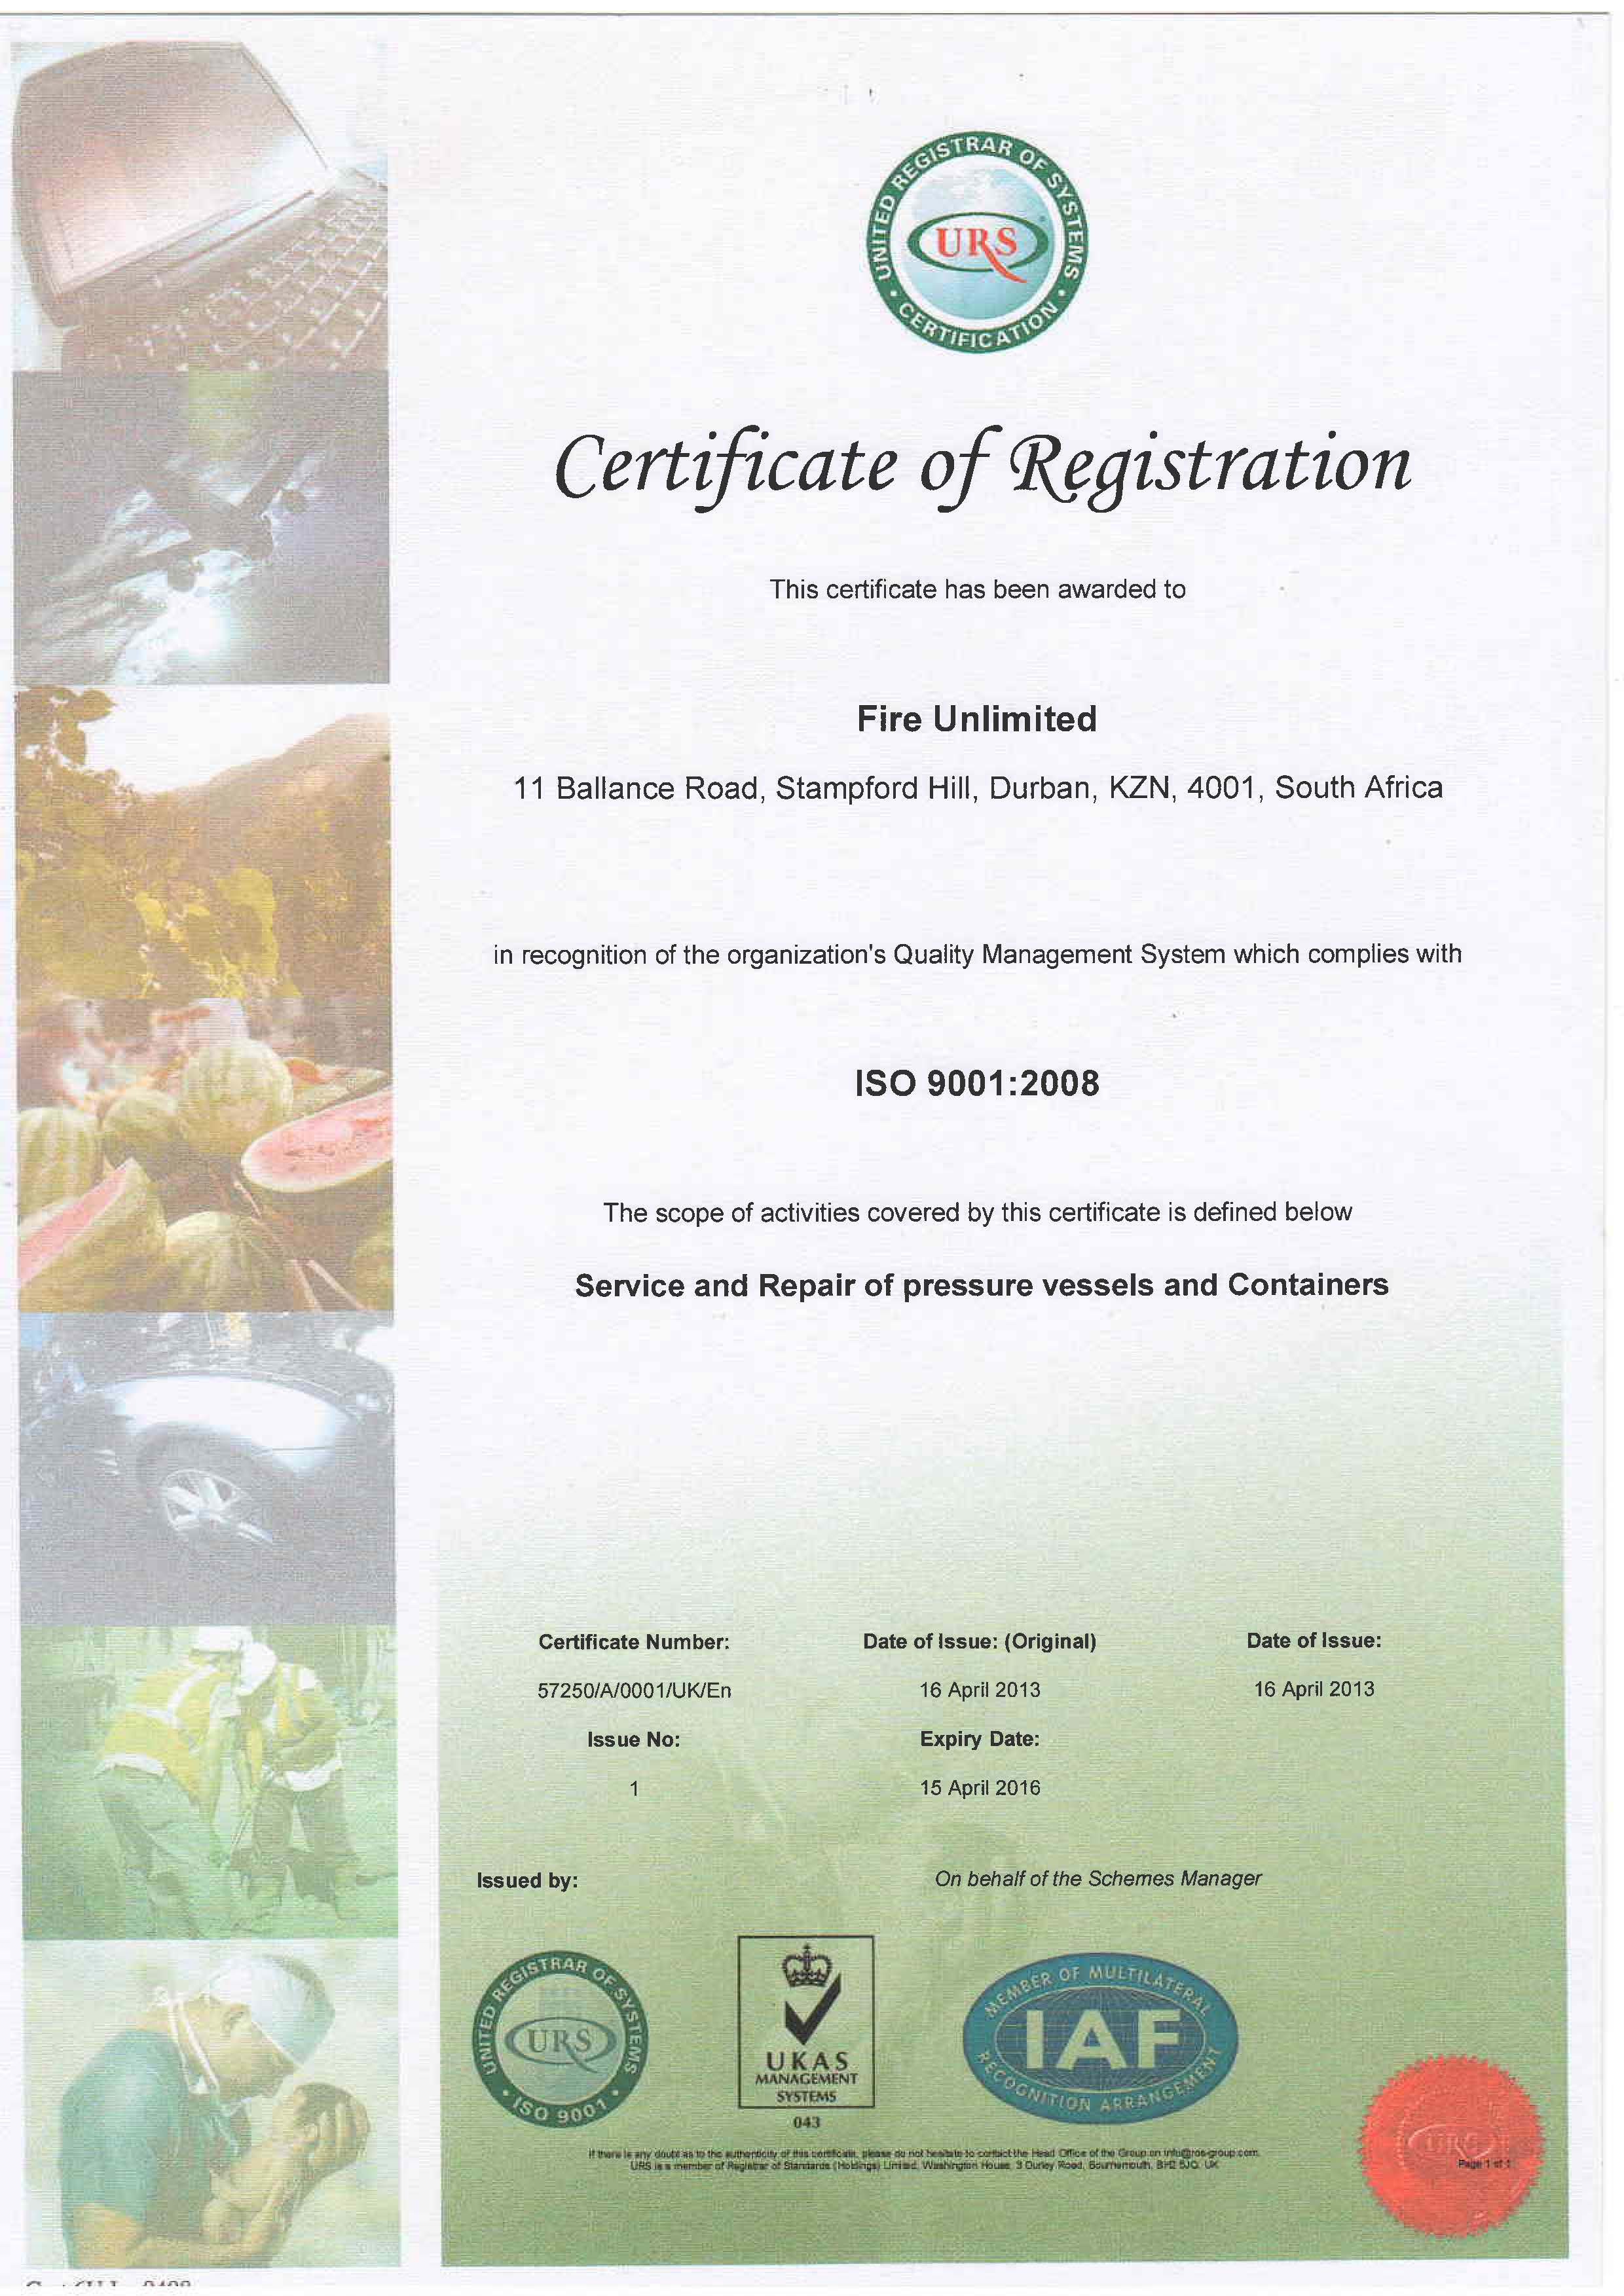 Iso9001g iso 9001 certification iso documentation xflitez Choice Image